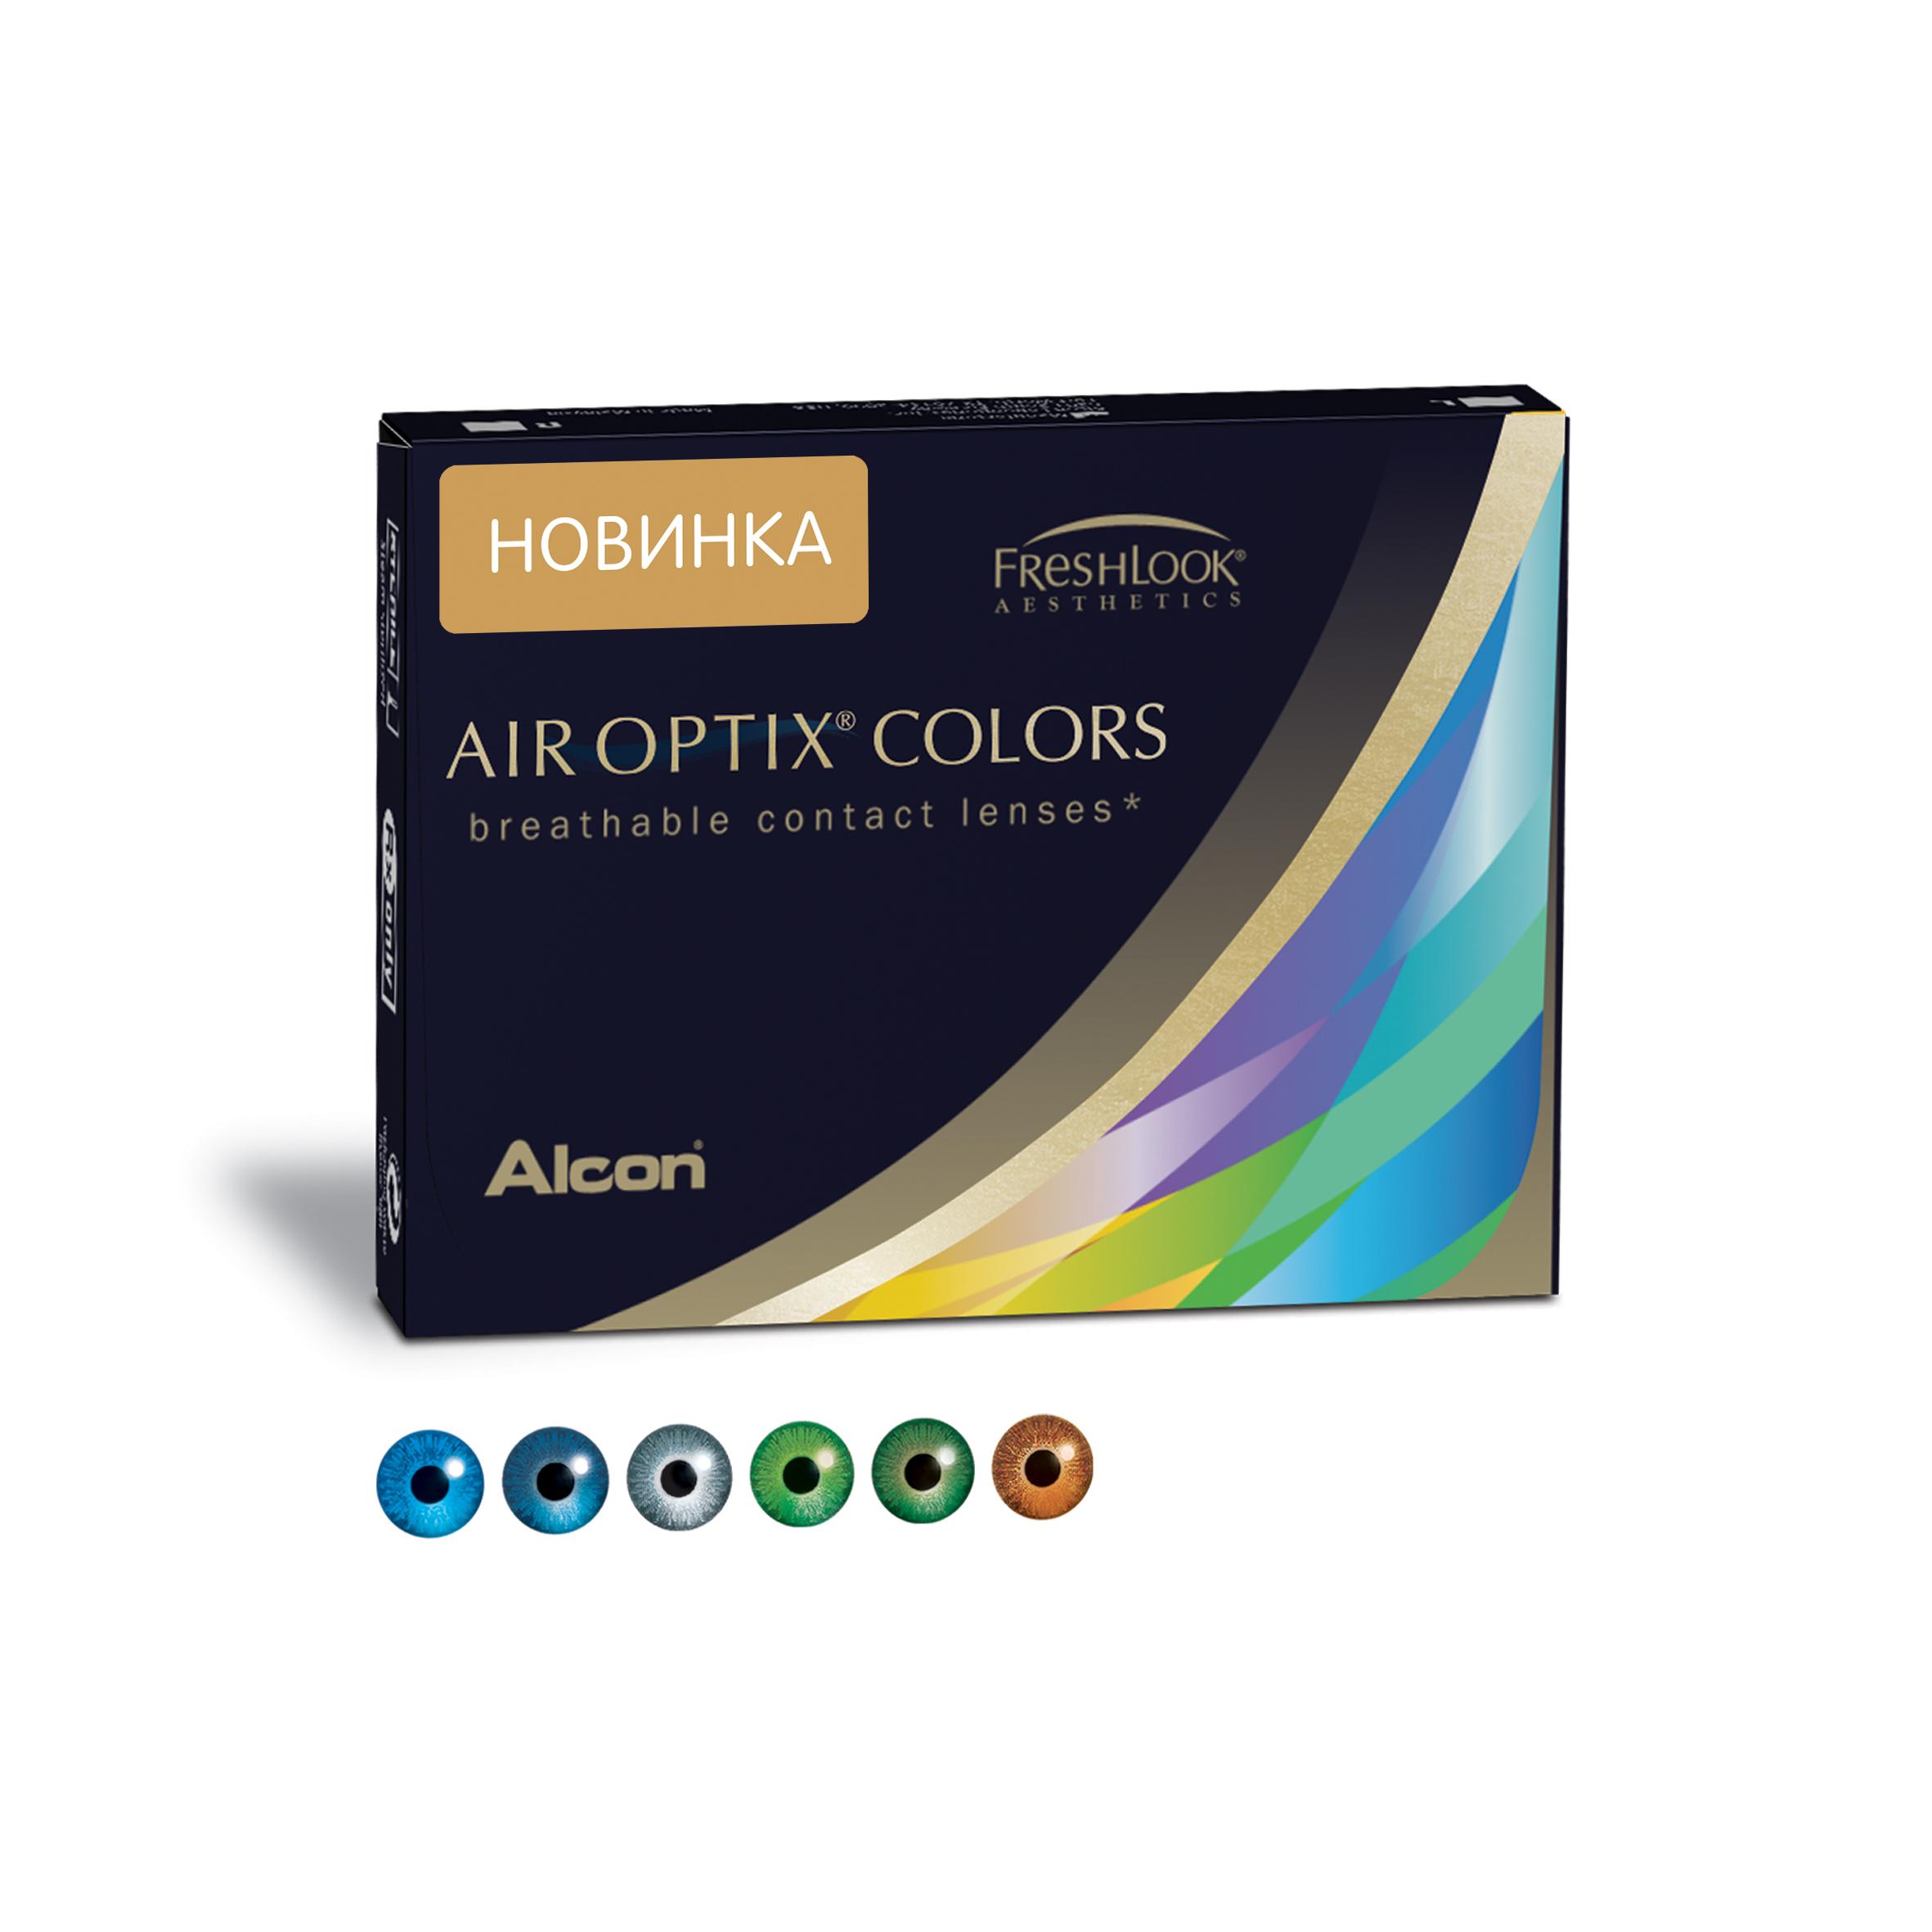 Аlcon контактные линзы Air Optix Colors 2 шт -2.25 Green31746171Мягкие контактные линзы